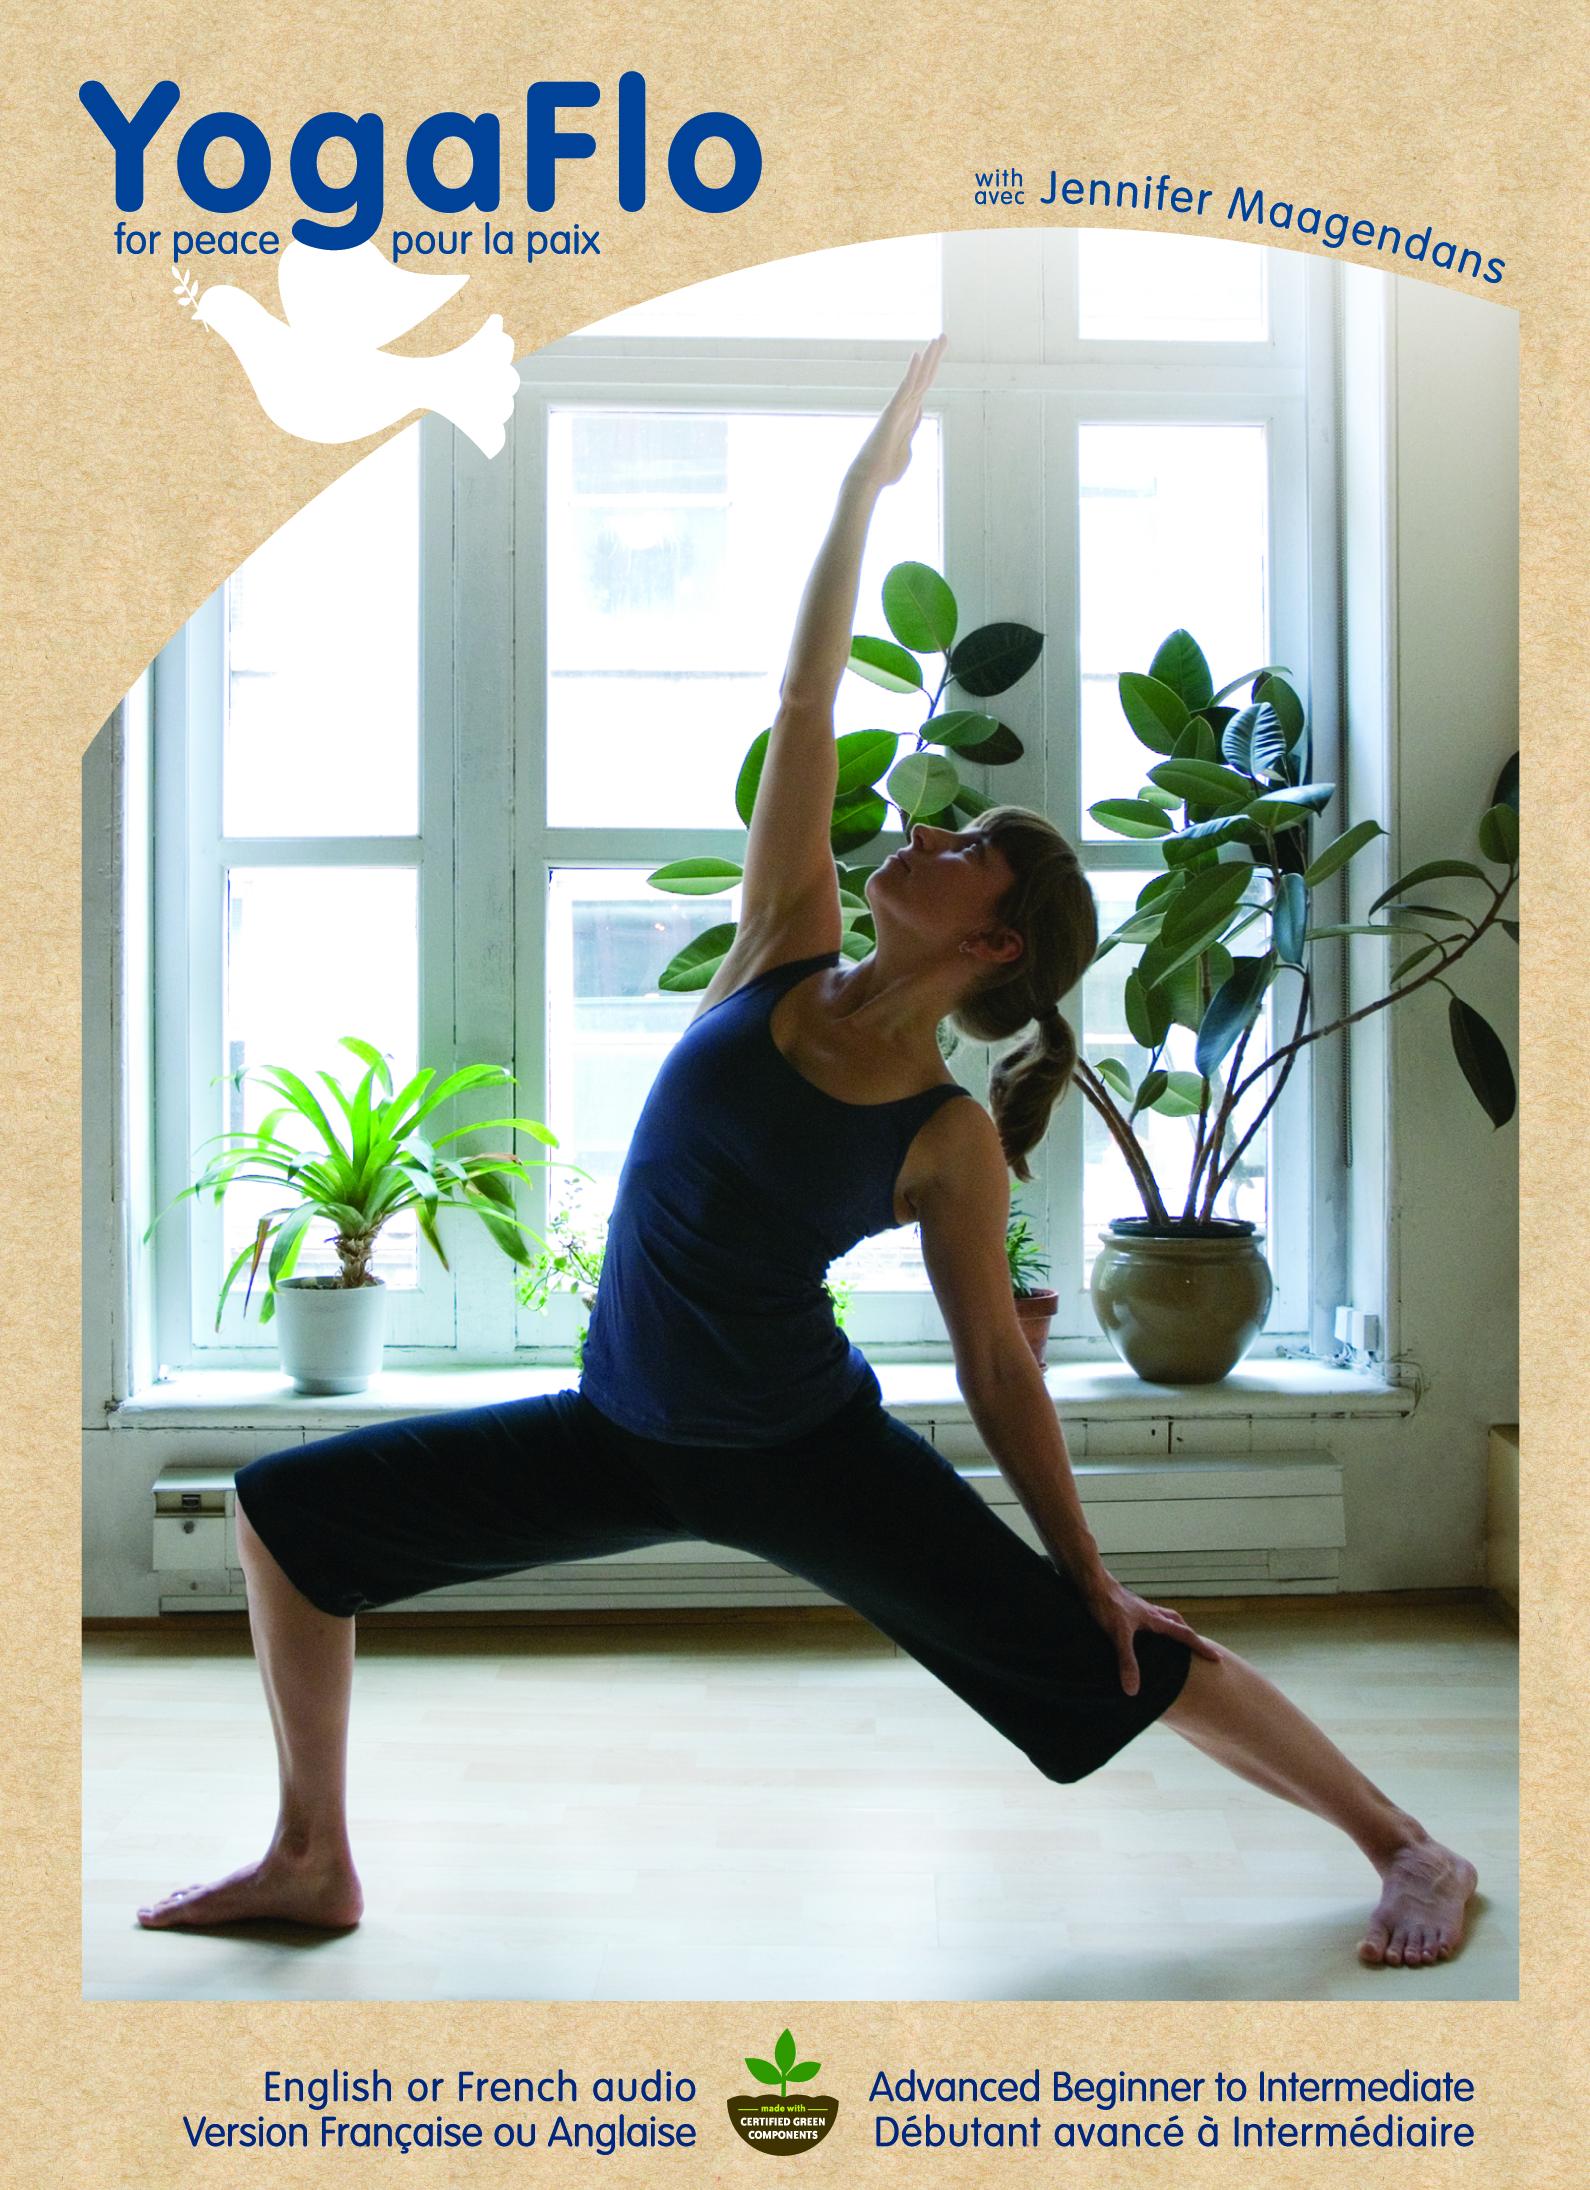 YogaFlo for peace